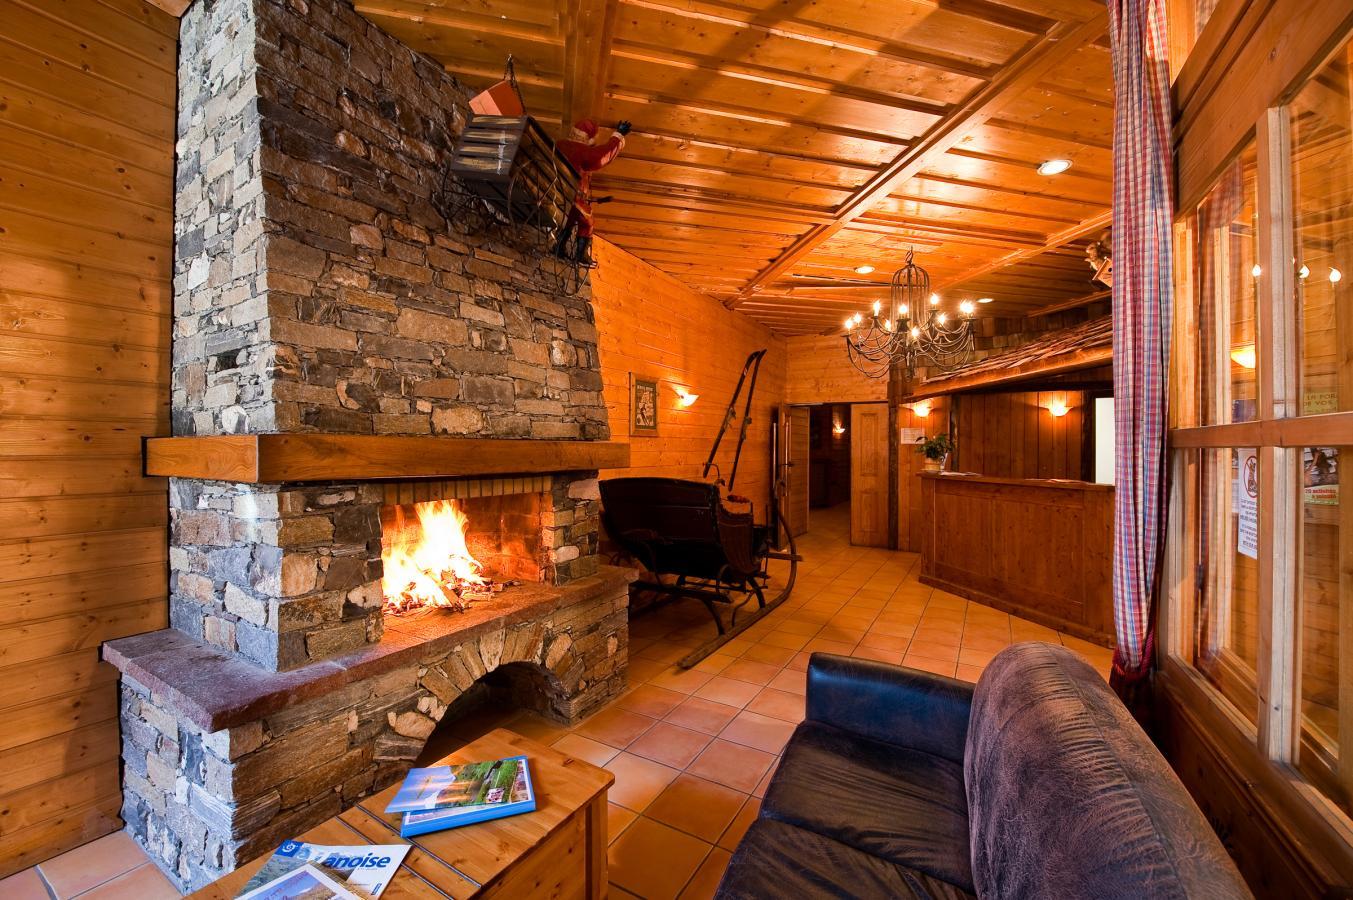 chalet altitude 20 val thorens location vacances ski. Black Bedroom Furniture Sets. Home Design Ideas